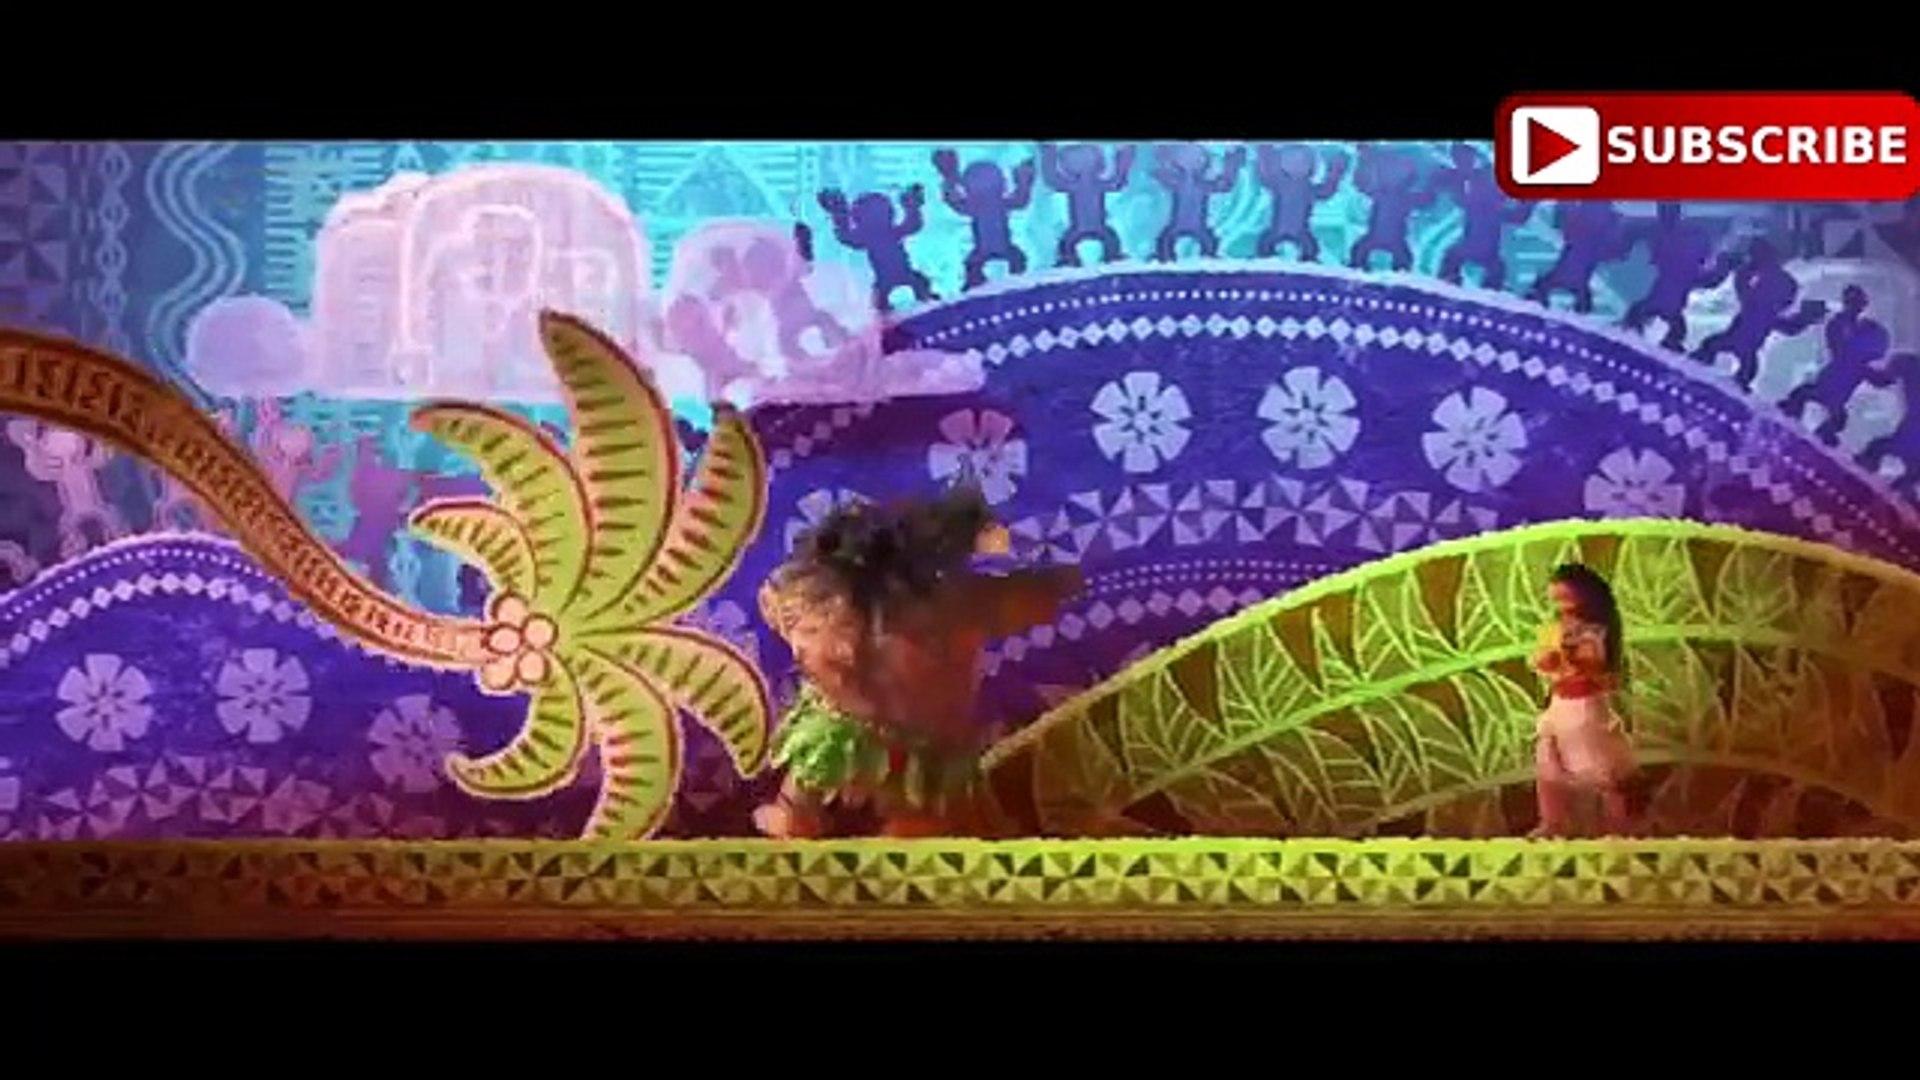 Disney's MOANA Movie - Best Moana Exclusive Movie Scenes - Dwayne Johnson Disney Animated Movie